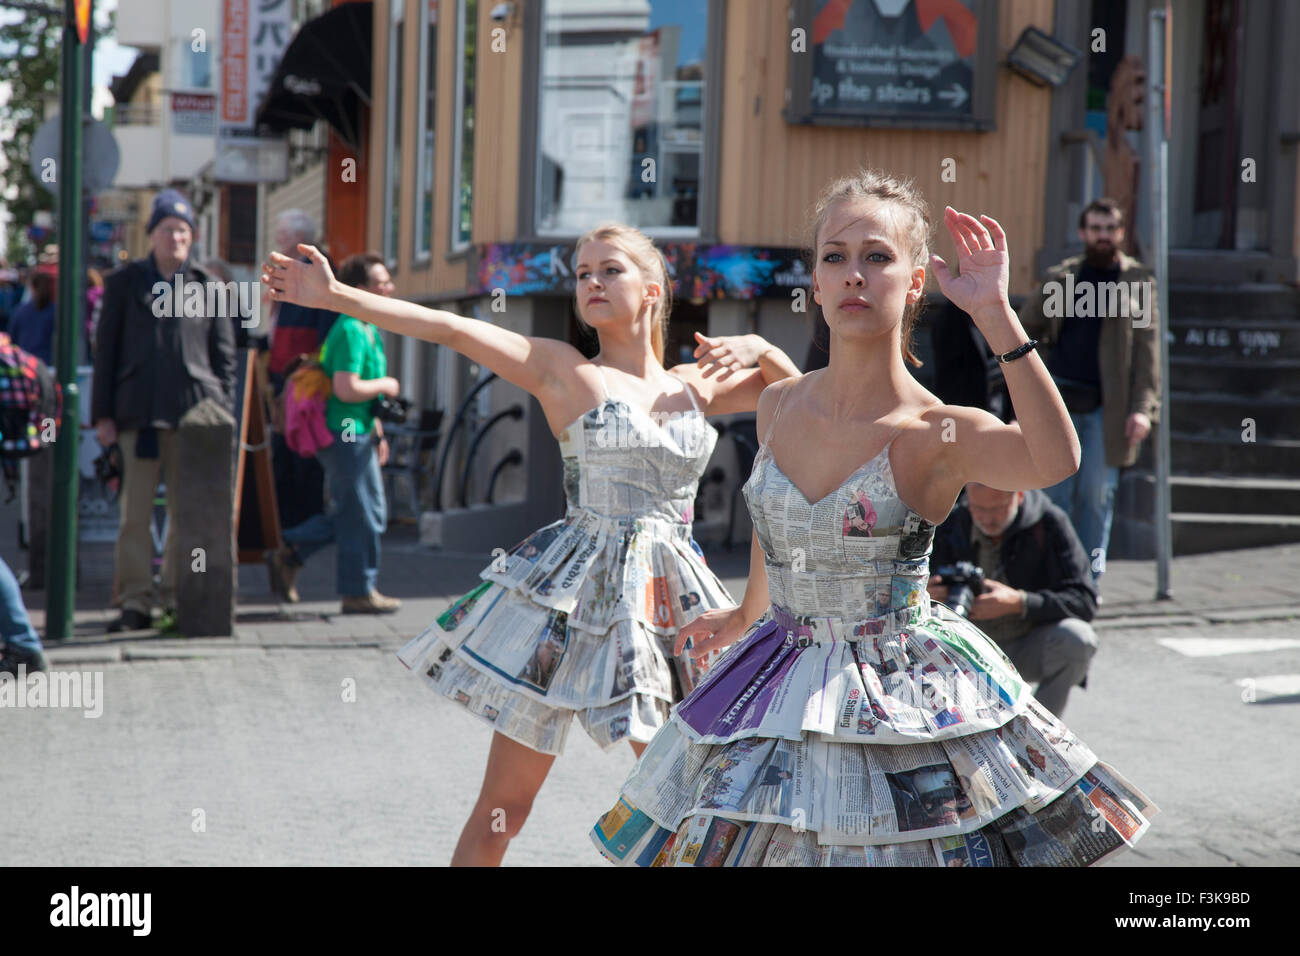 City centre street performers, Laugavegur, Reykjavik, Iceland. - Stock Image